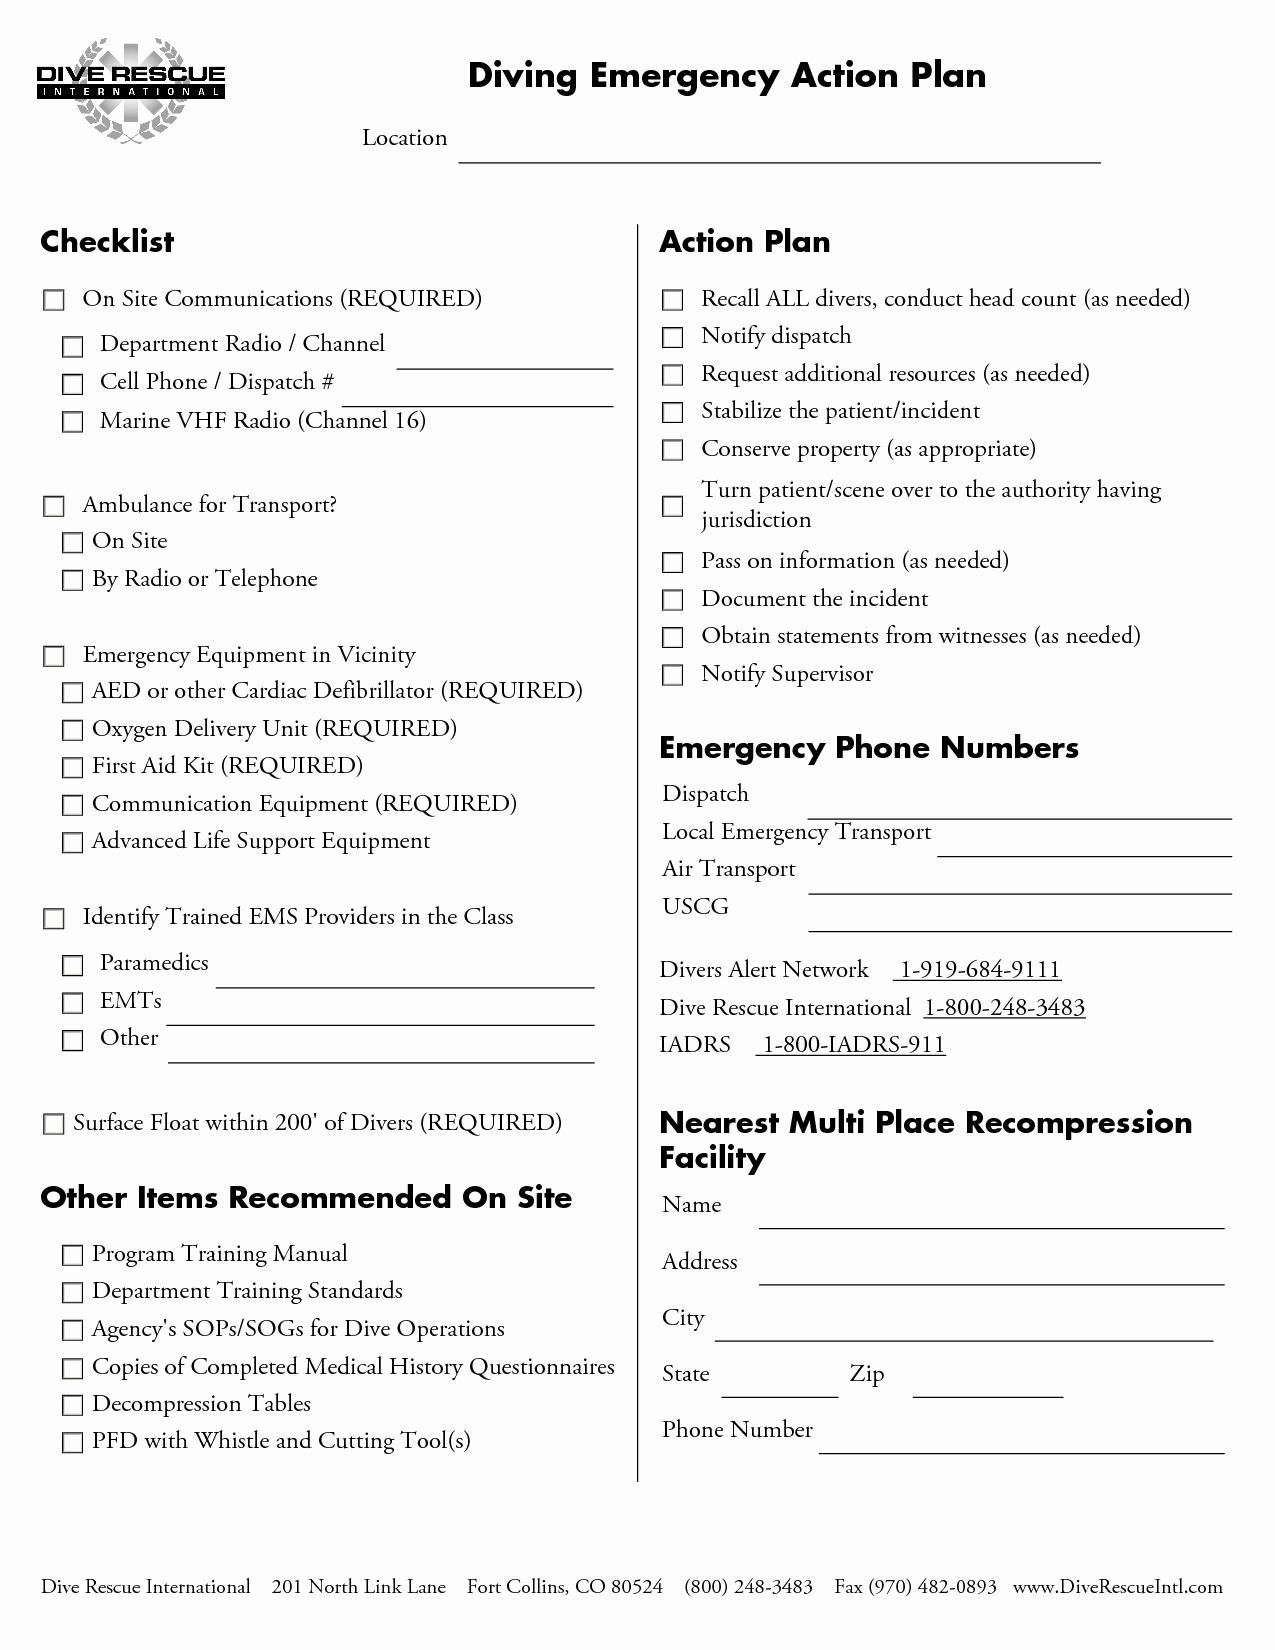 Osha Emergency Action Plan Template Inspirational Emergency Action Plan Template